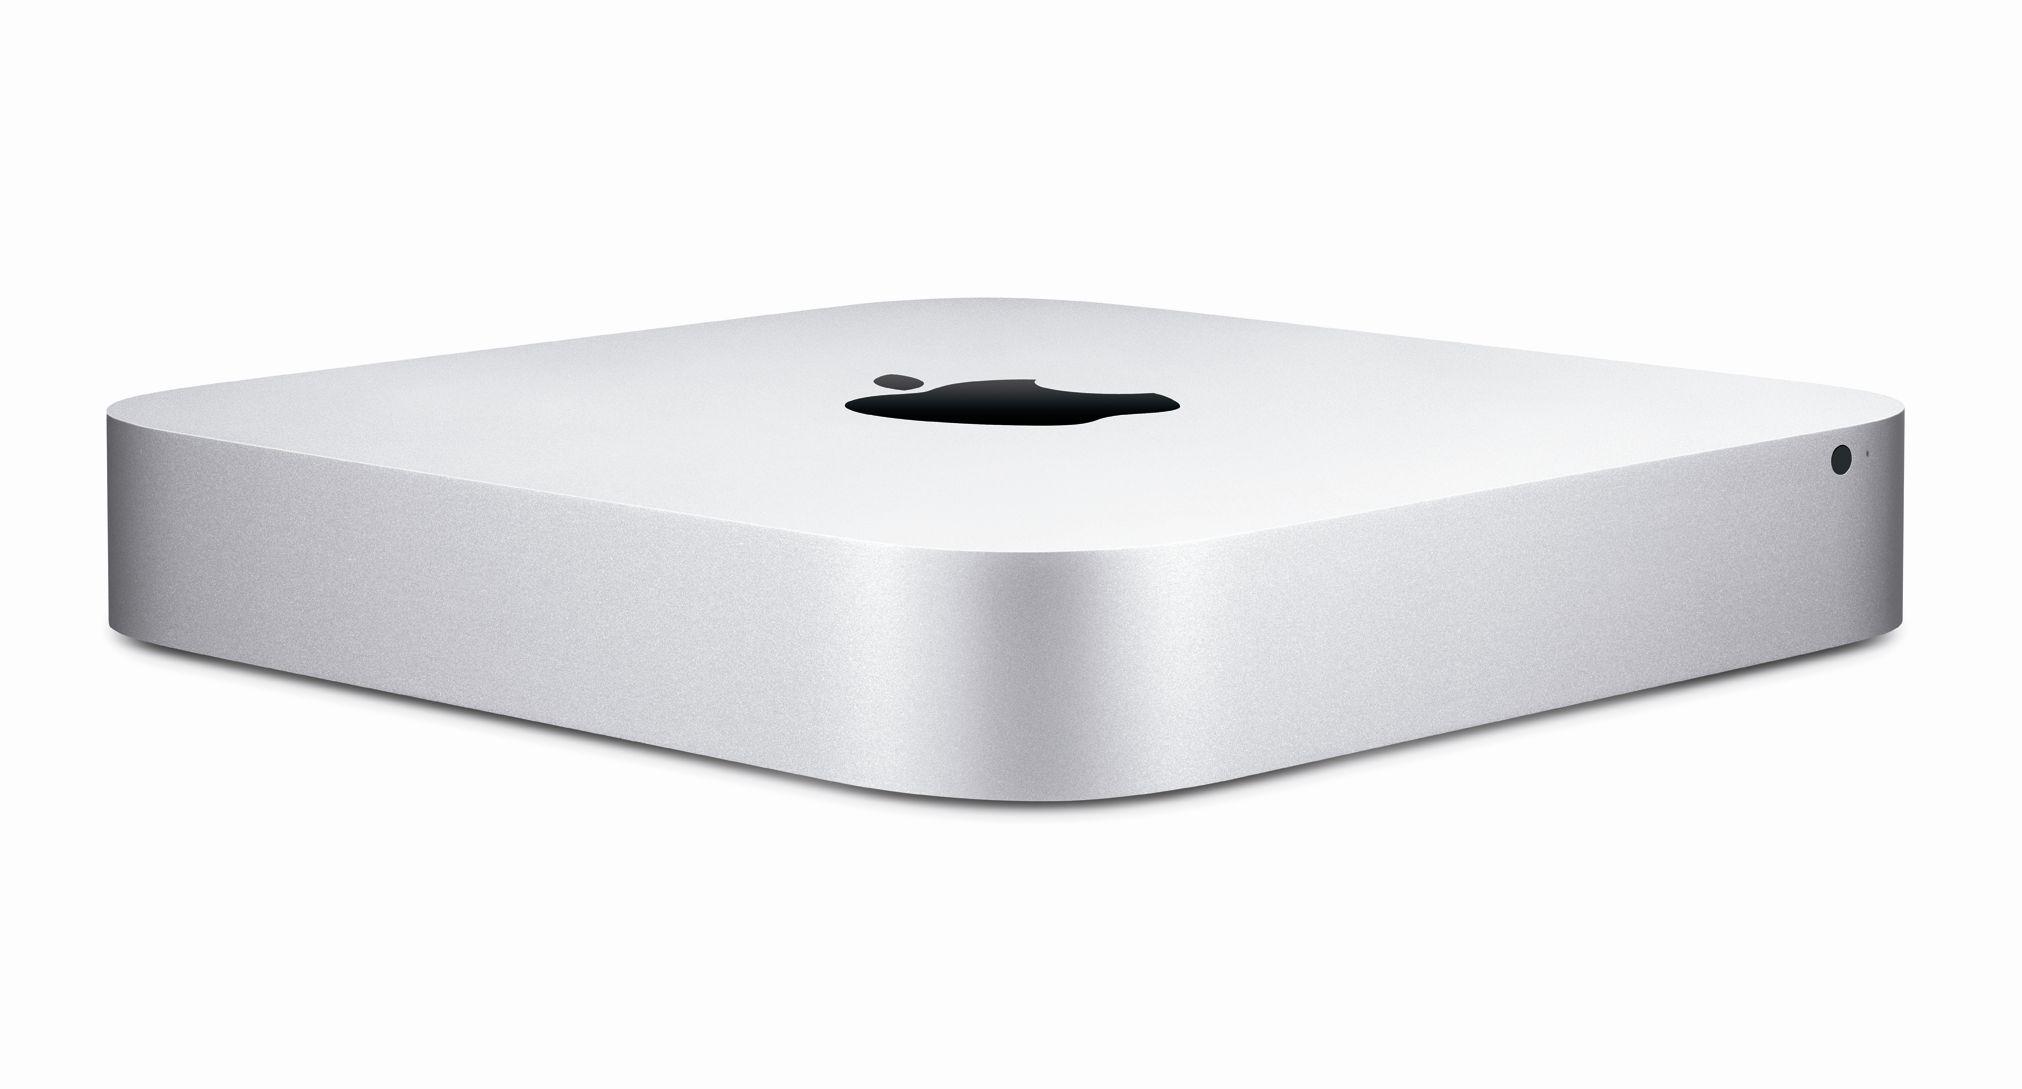 Refurbished Apple A Grade Desktop Computer Mac mini Aluminum Unibody 2.6GHZ Dual Core i5 (Late 2014) MGEN2LL/A 8 GB DDR3 1 TB HDD Intel Iris Graphics 5100 Sierra 10.12 0